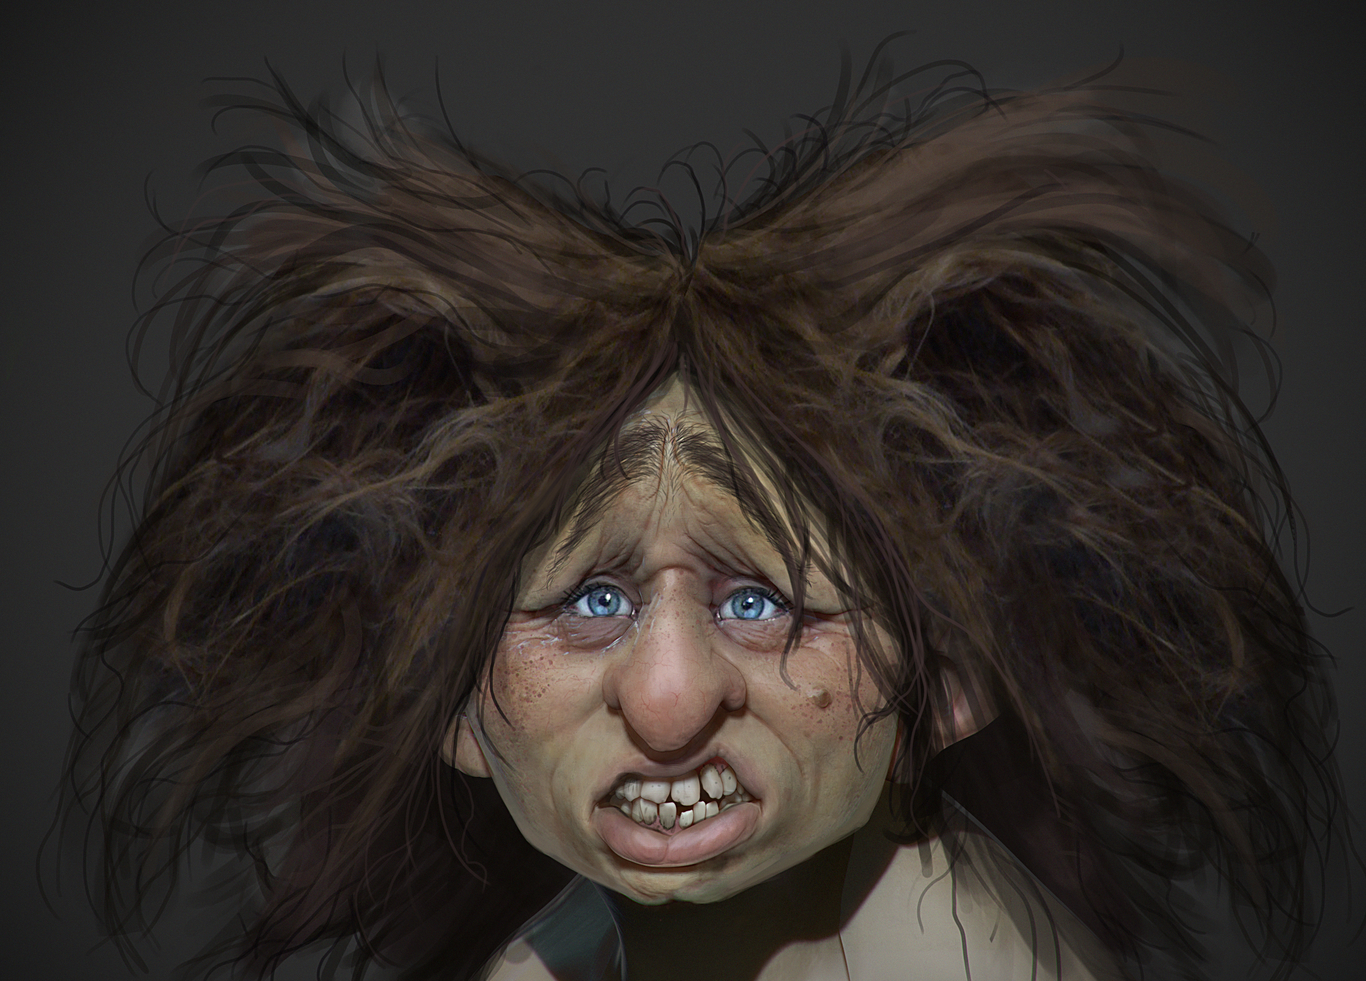 Cryptcreeper sick troll 1 9309aeb7 6nat